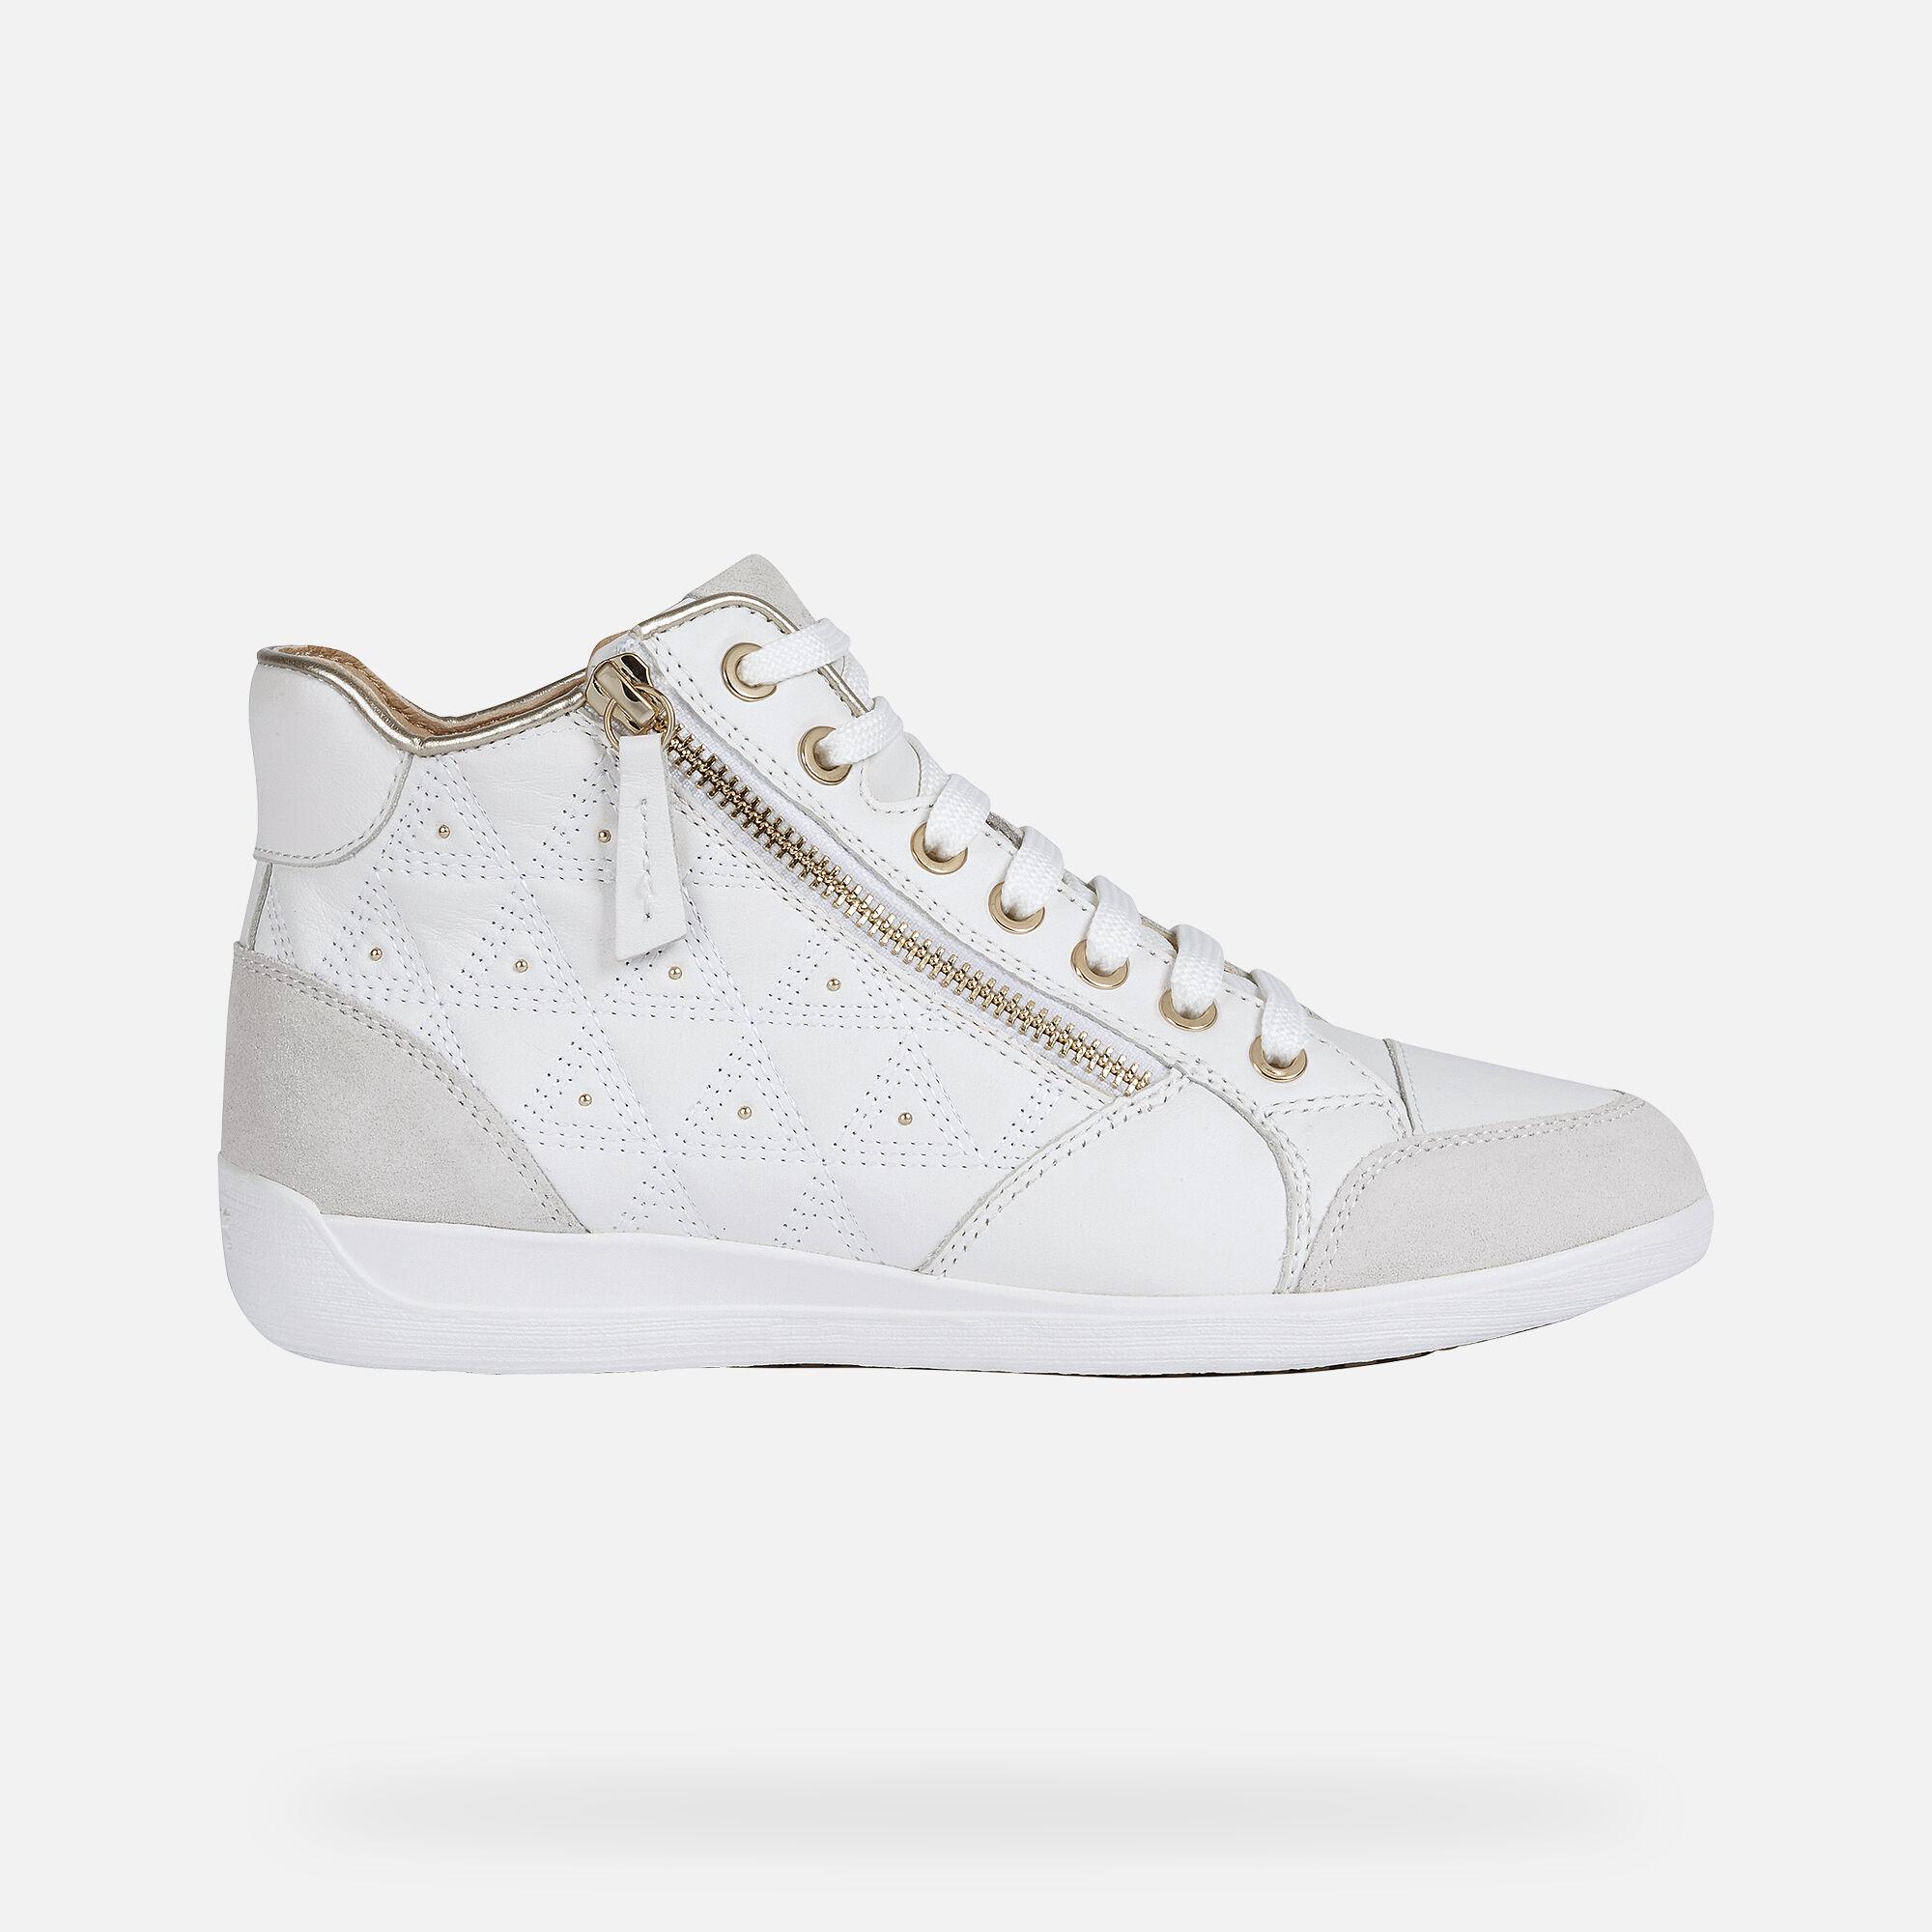 Geox MYRIA Woman: White Sneakers | Geox